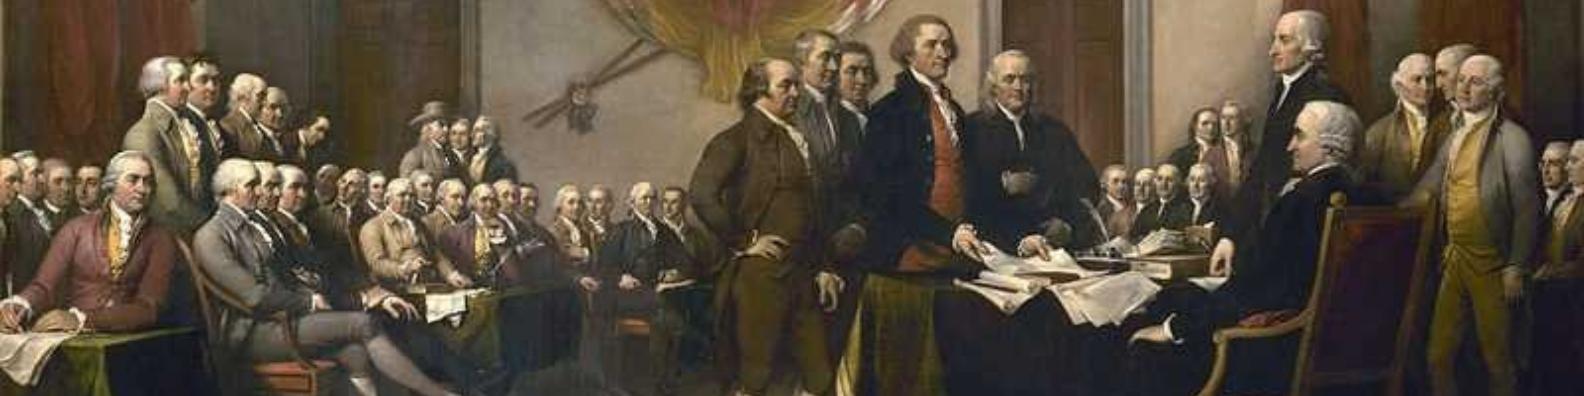 Dec of Independence